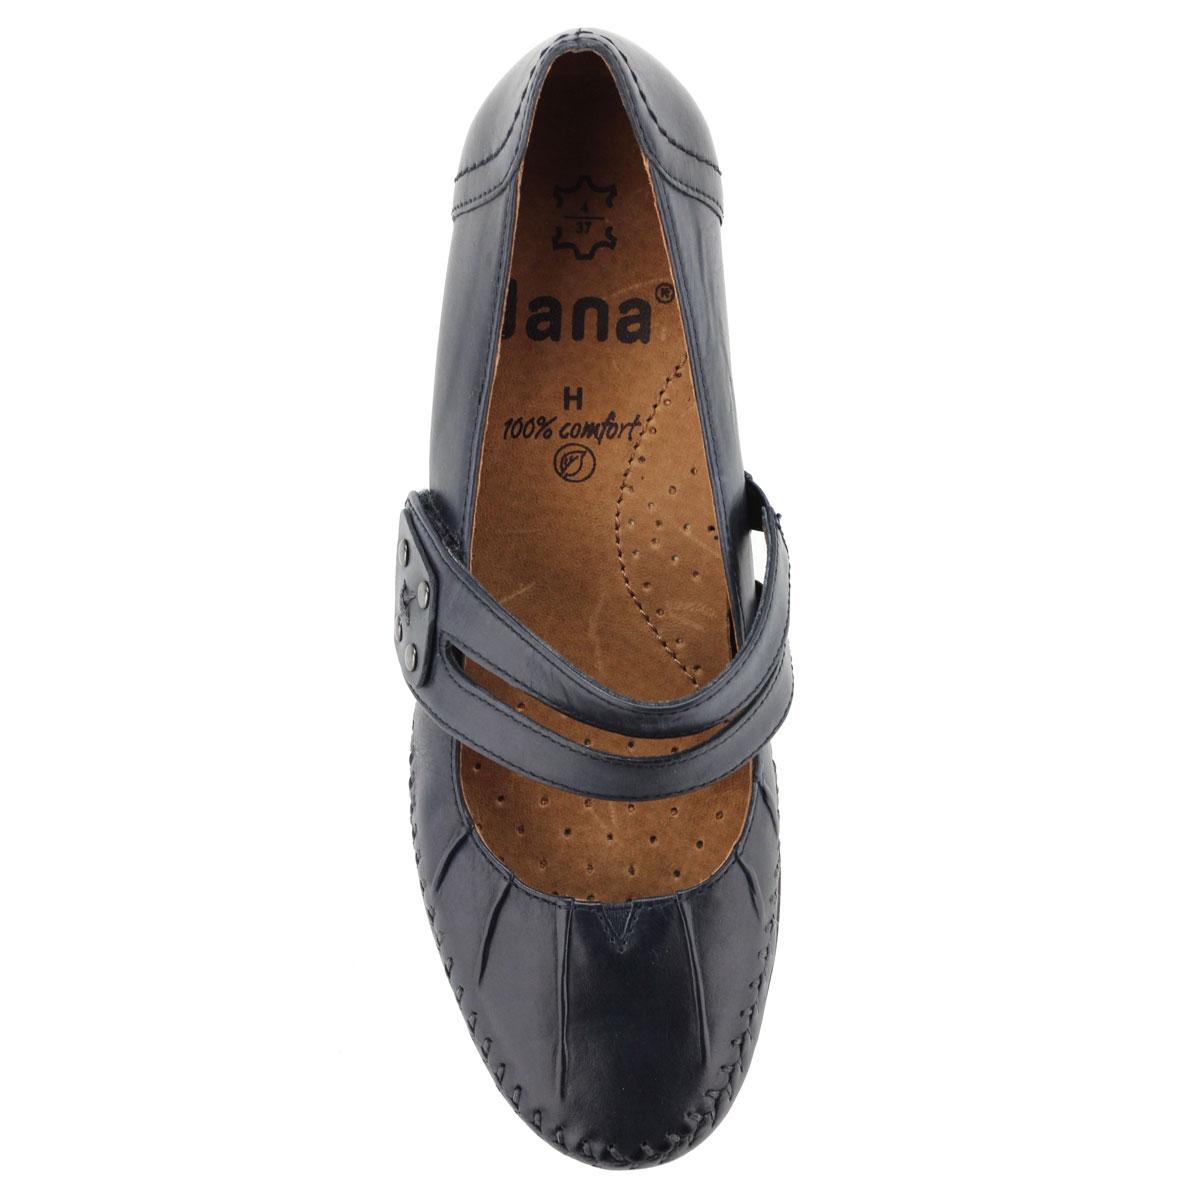 Pántos Jana bőr cipő - ChiX Női Cipő Webáruház 9e4568f262